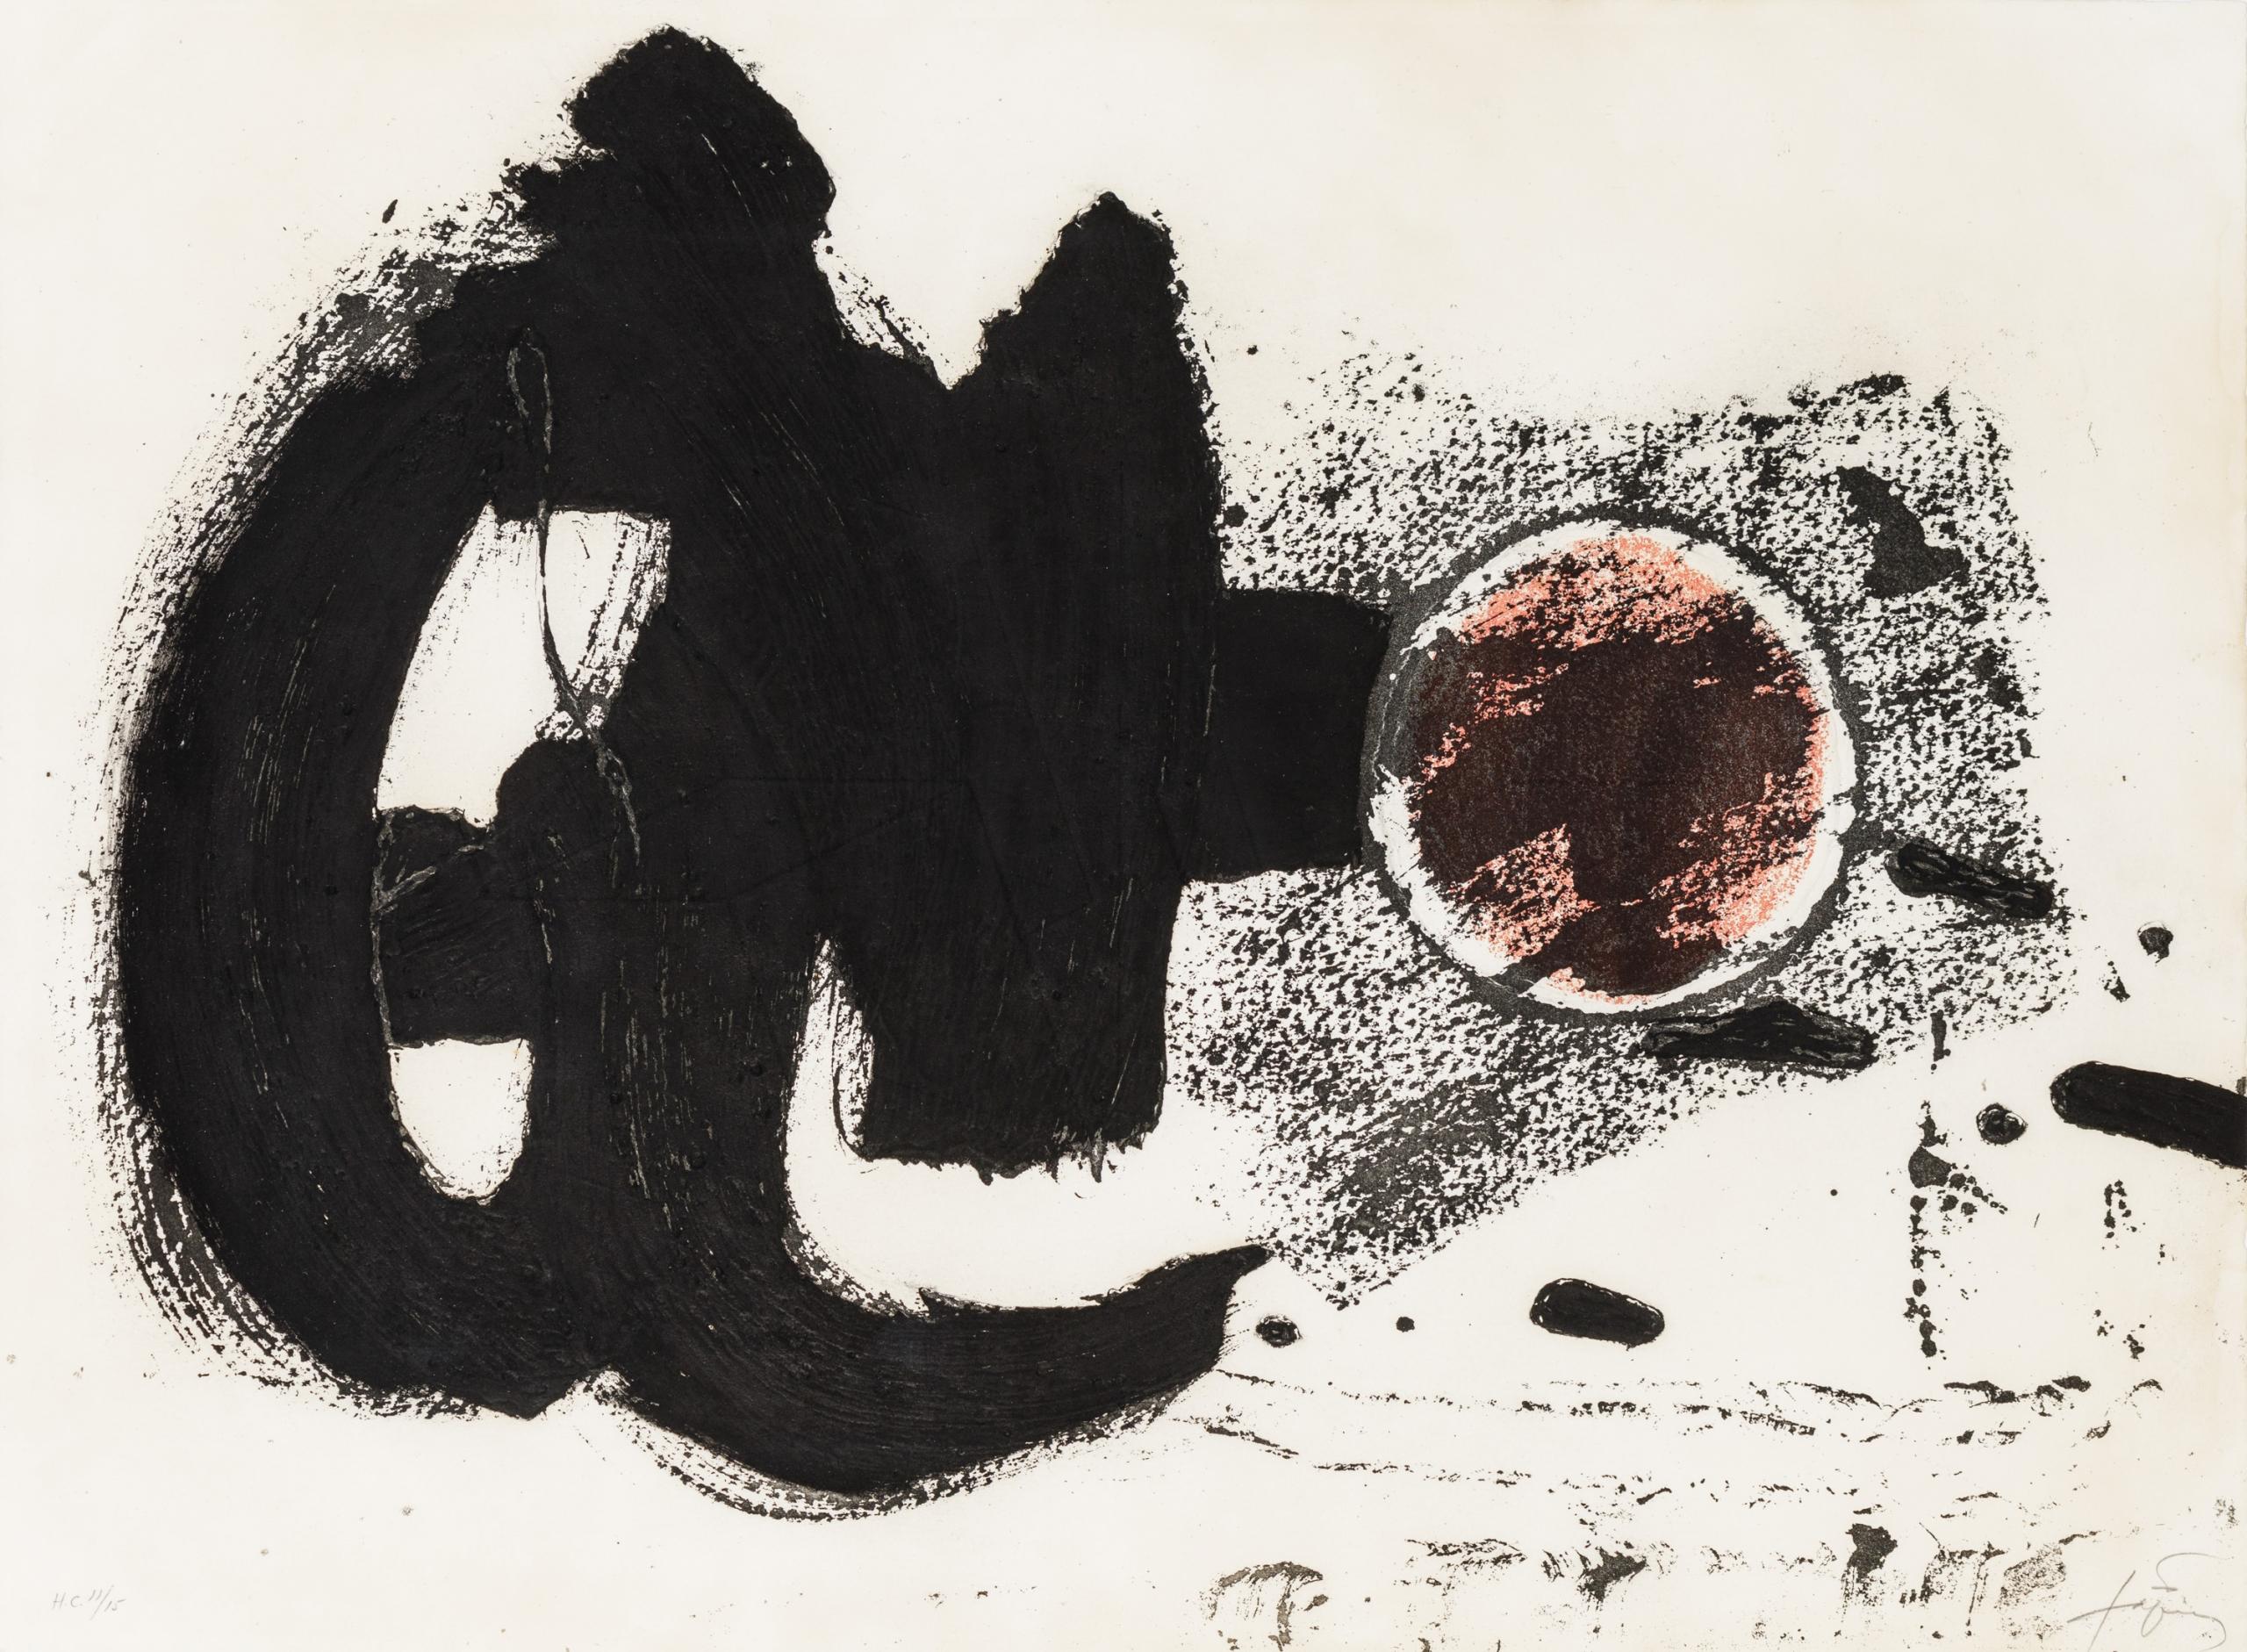 Antoni Tapies, Cercle II